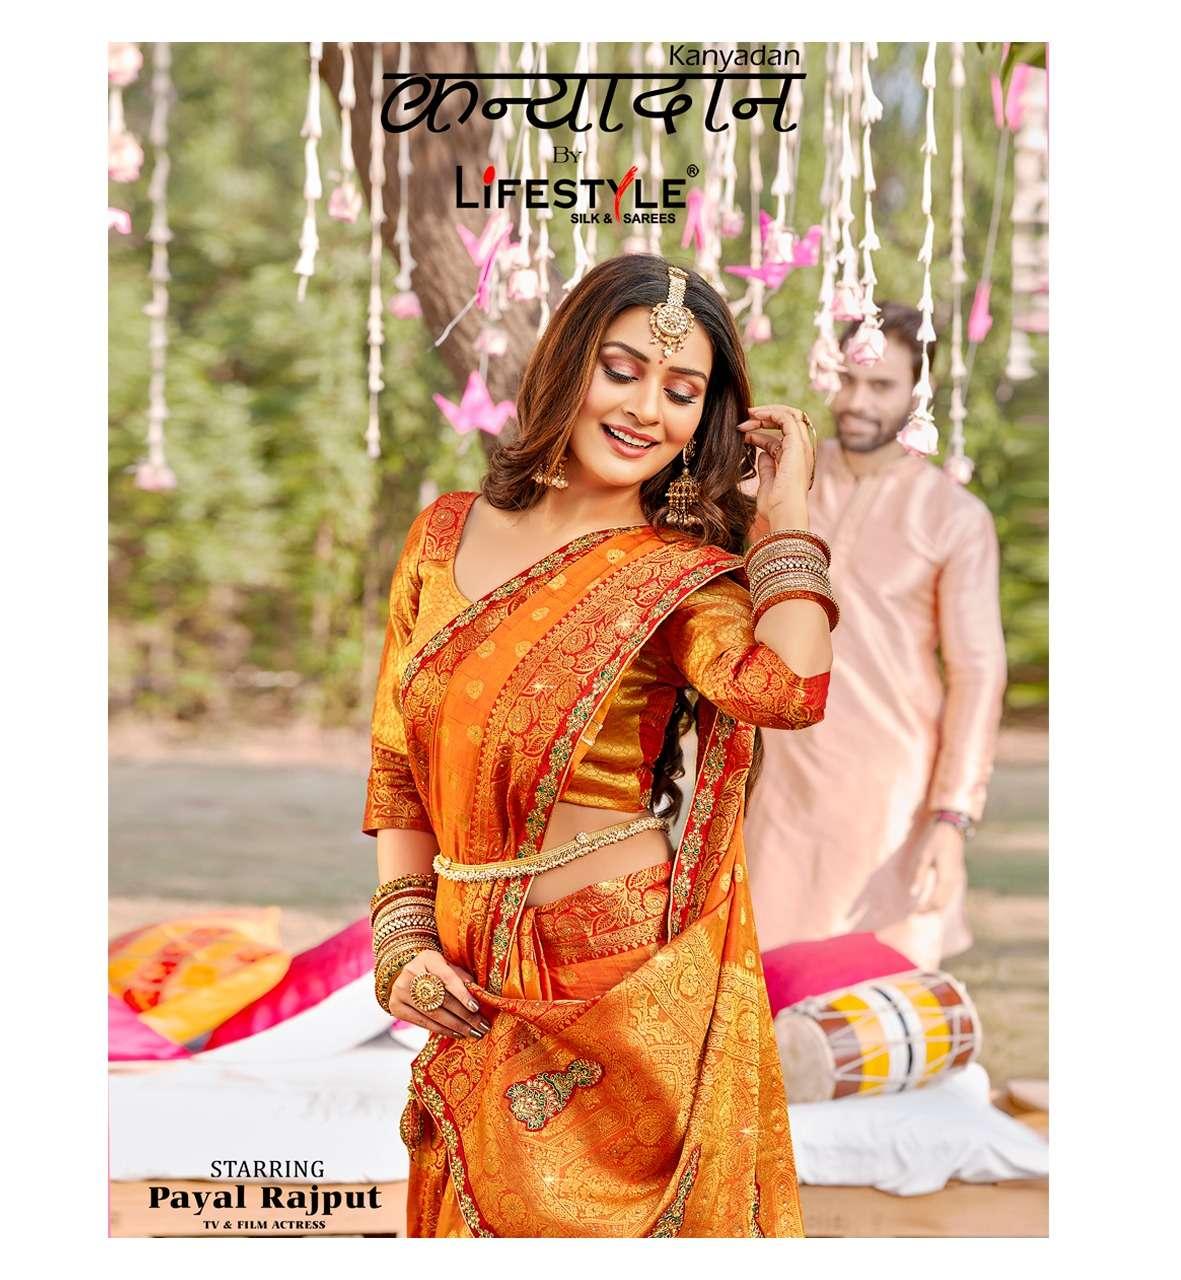 Lifestyle Kanyadan Exclusive Sana Silk Saree catalog Wholesale Dealer in Surat